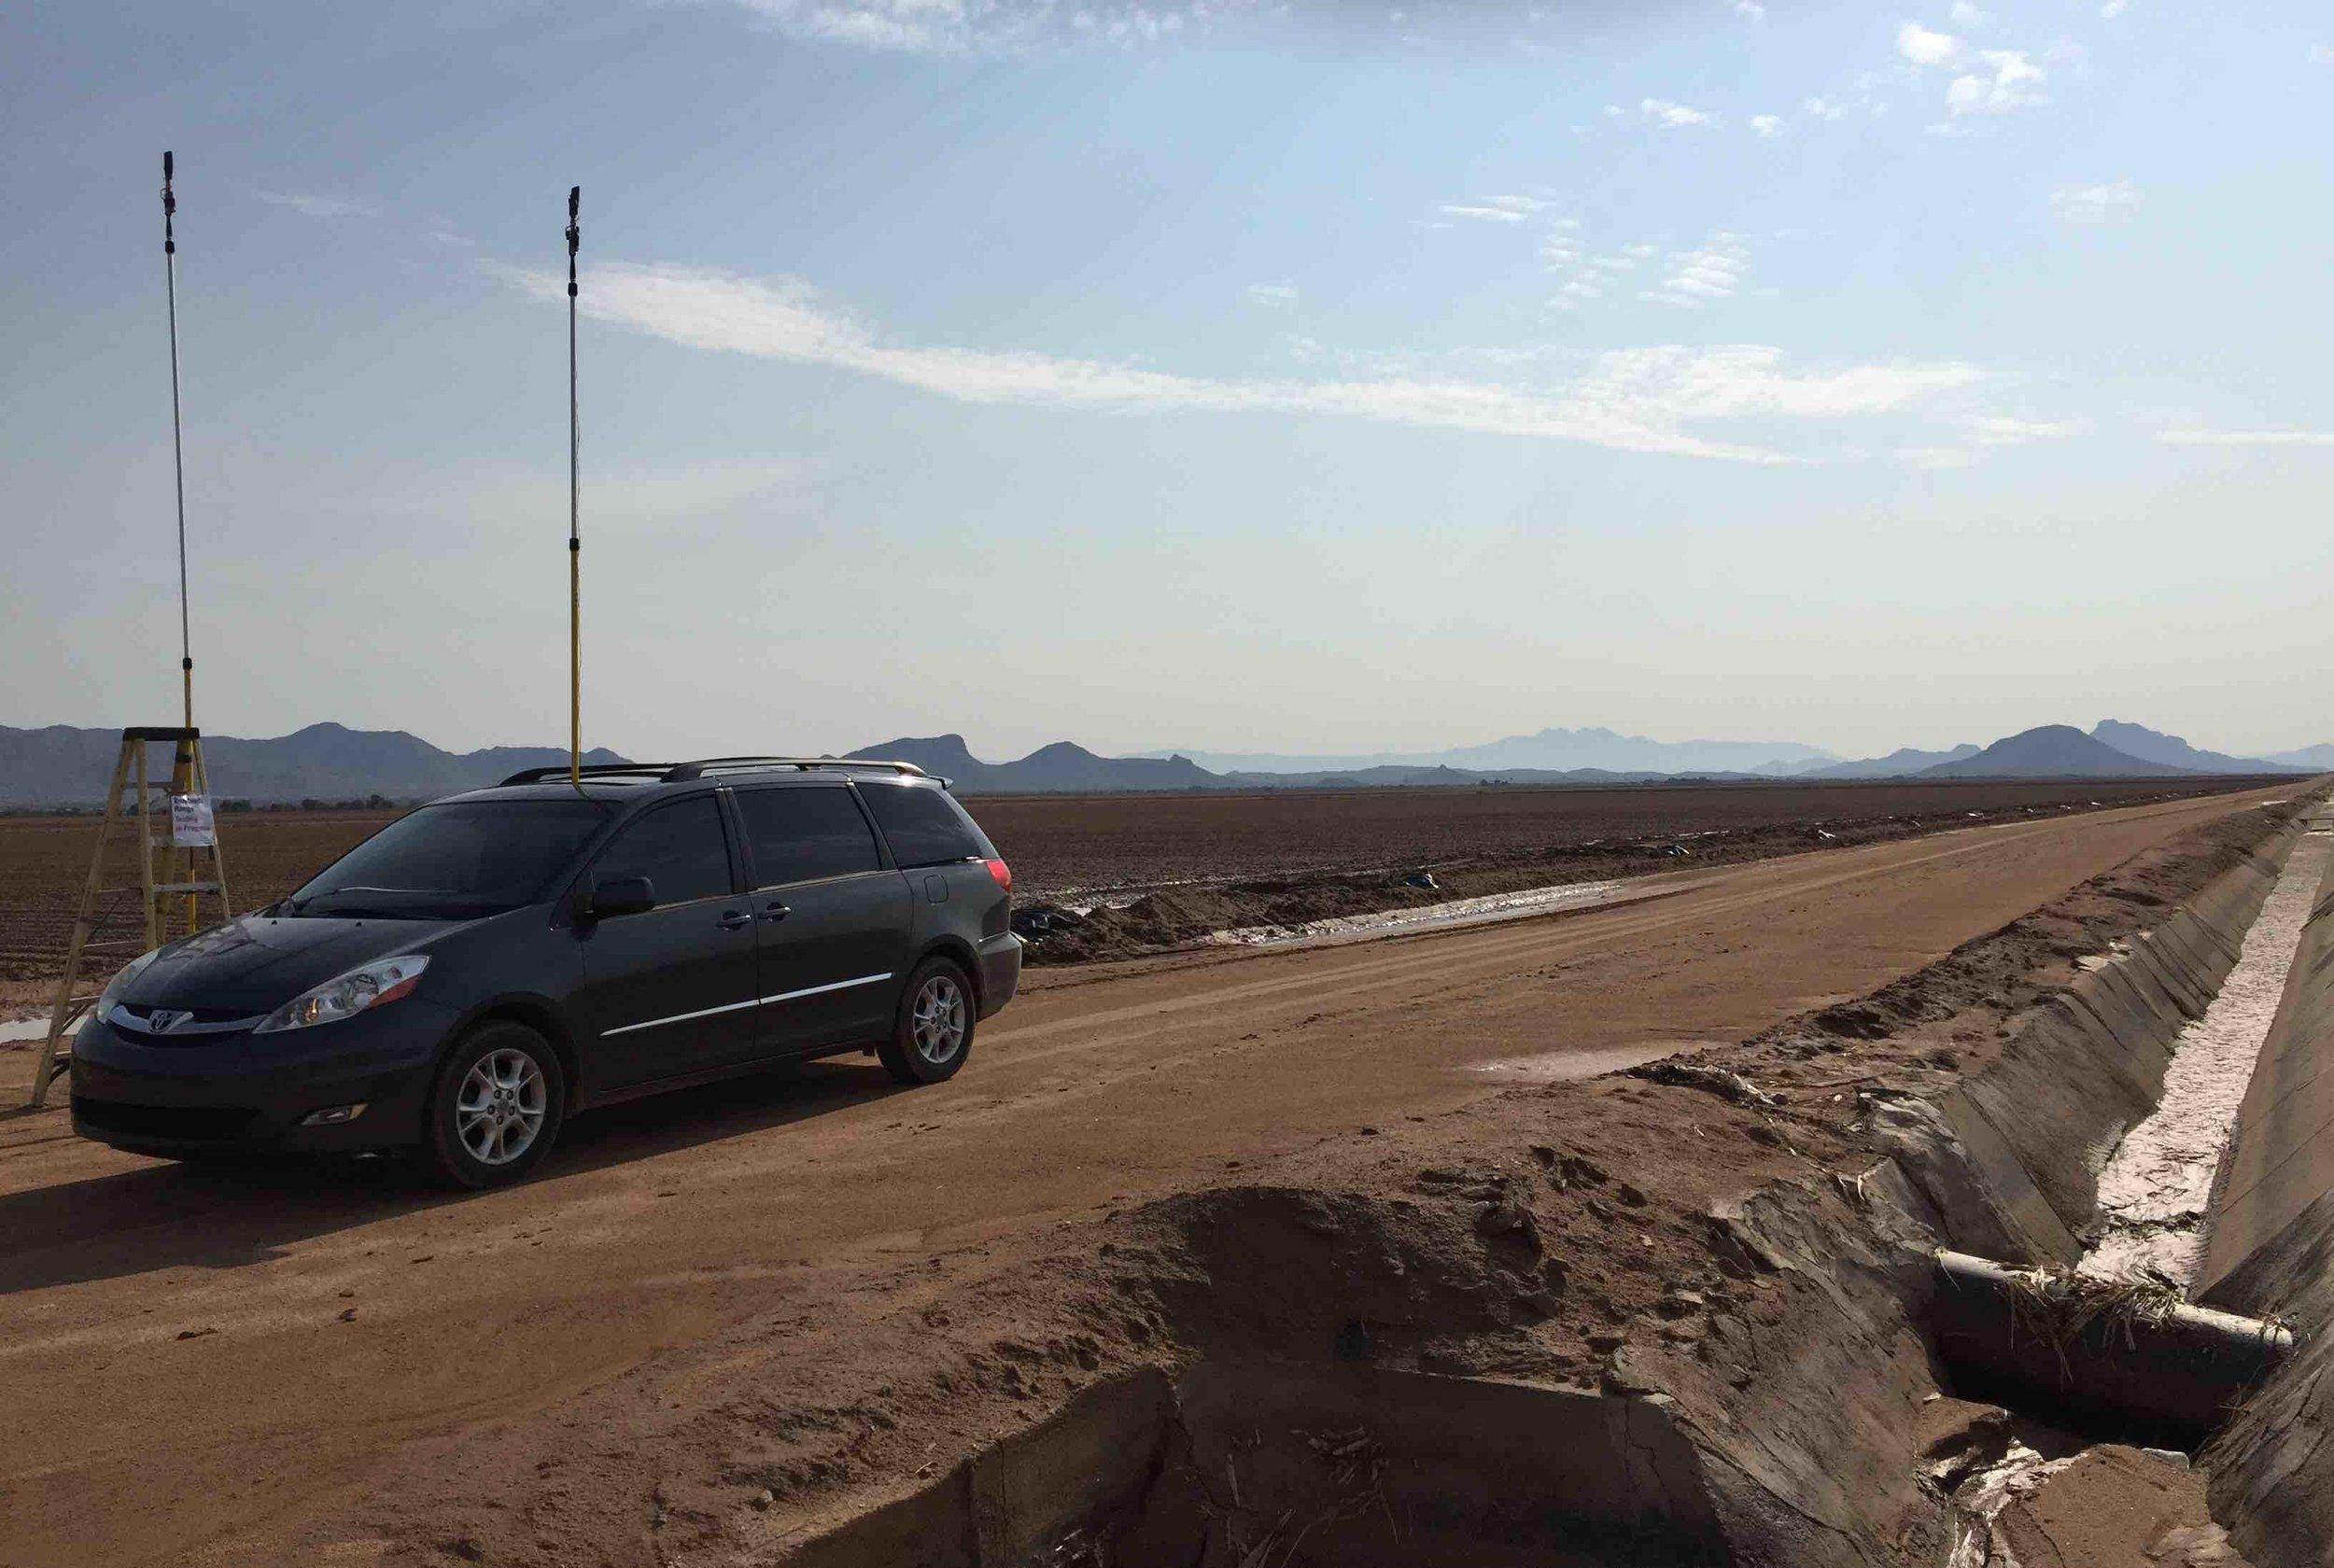 Street View of Scottsdale Arizona Test Site.